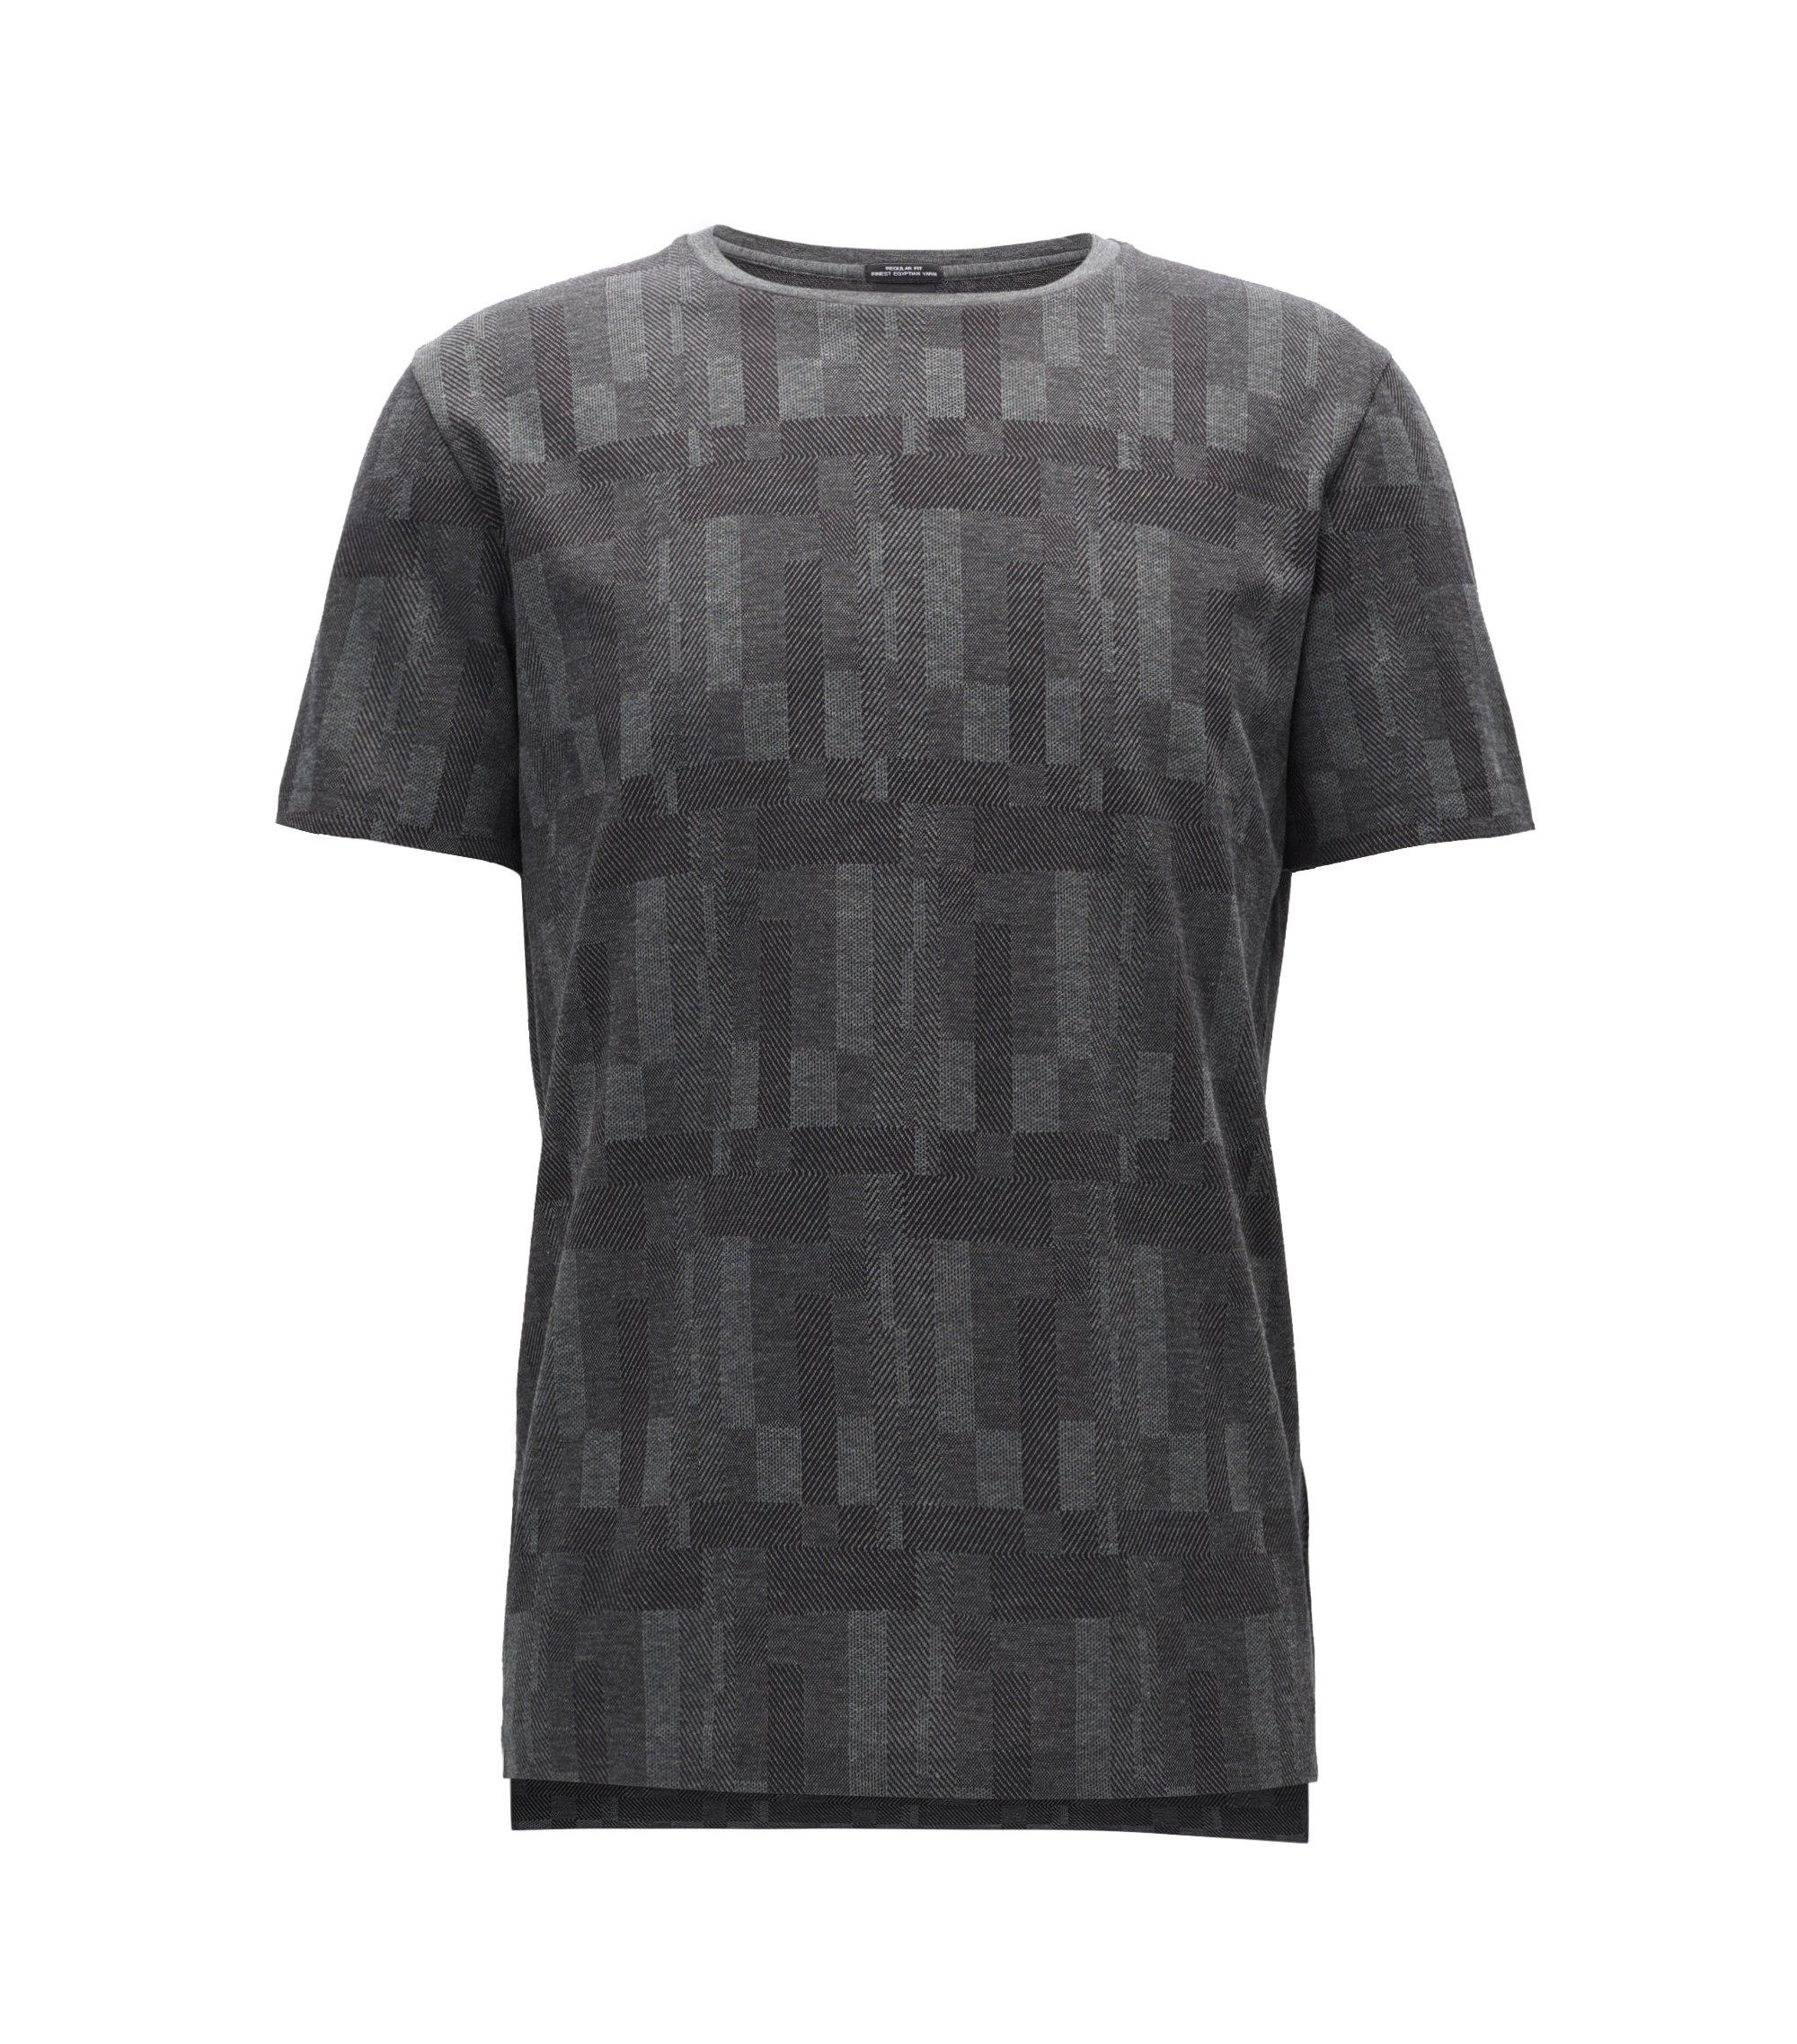 Patterned Egyptian Cotton T-Shirt | Tiburt, Grey